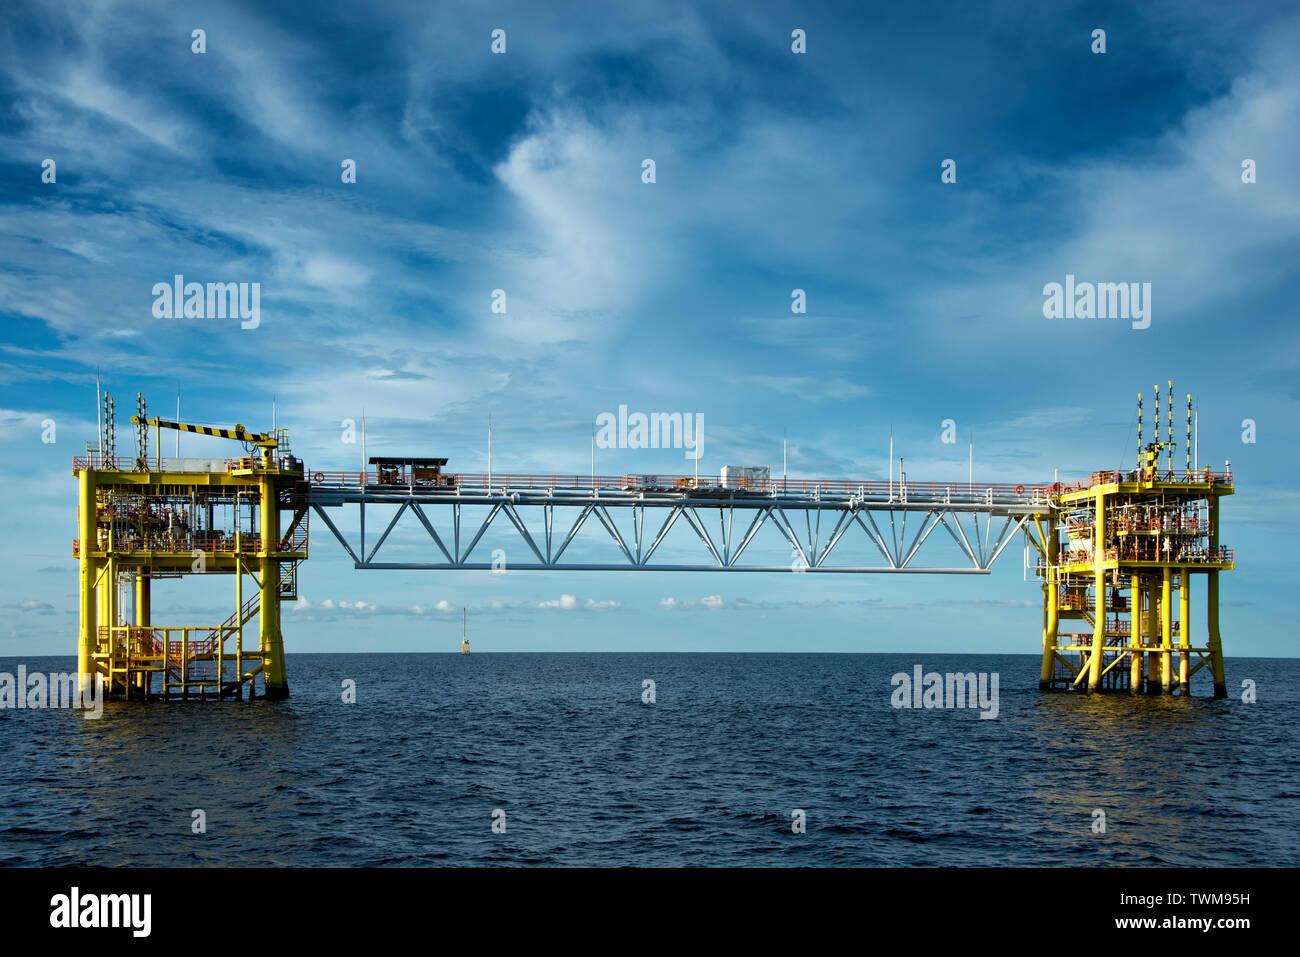 two jacket platform with bridge at south china sea - Stock Image